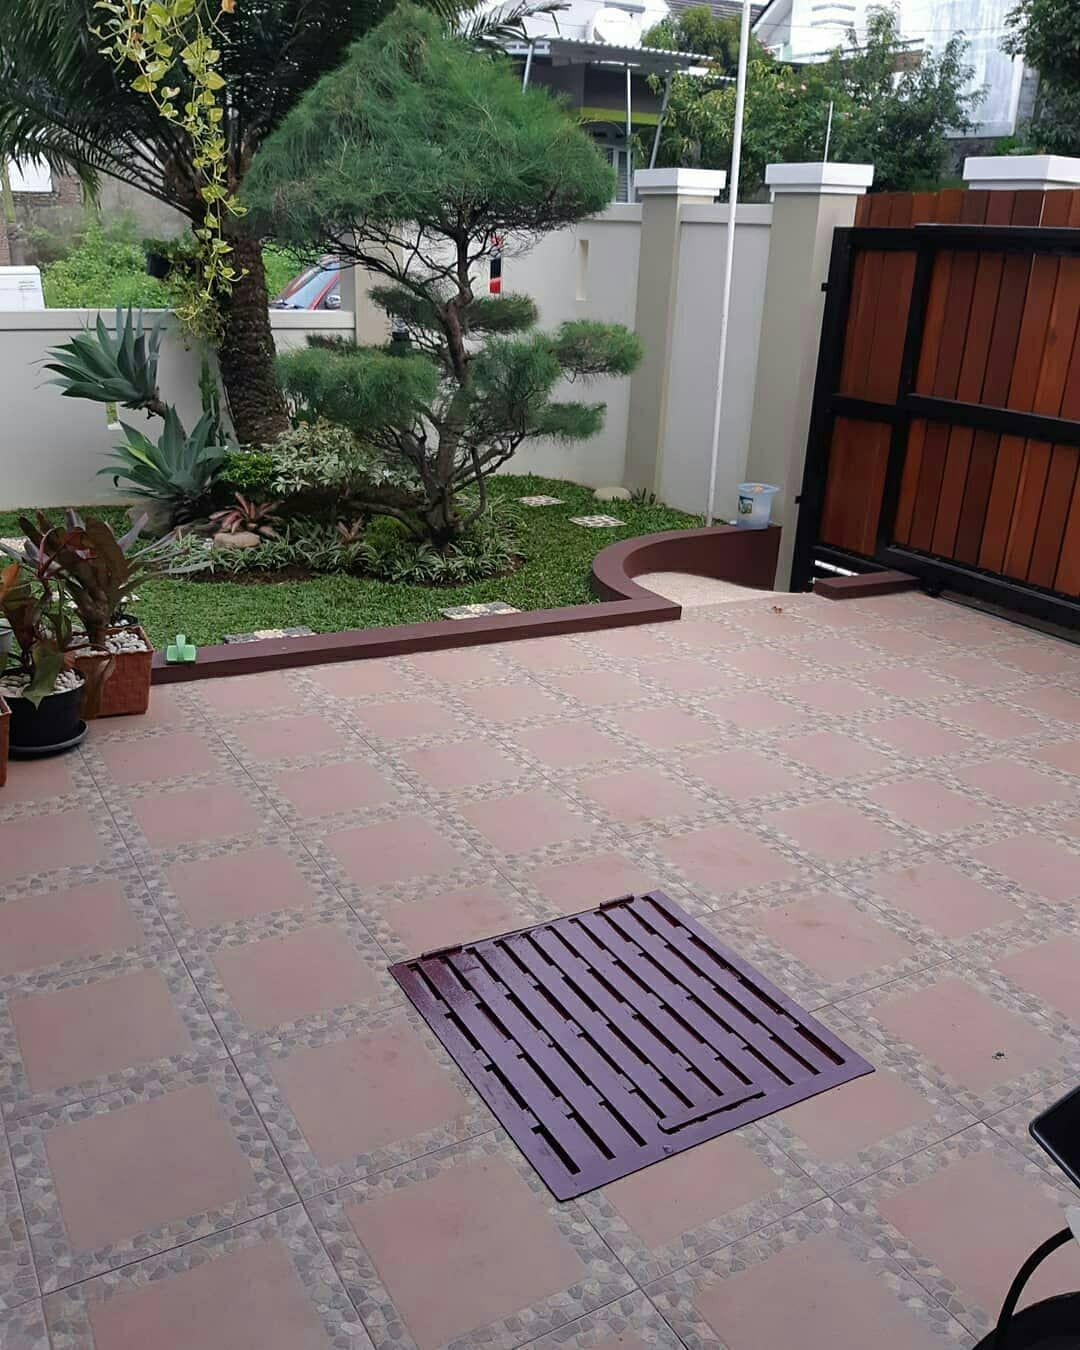 Taman Minimalis On Instagram Inspirasi Carport Dan Taman Minimalis Di Rumahnya Rumahrani S Minimalist House Design Garden Deco Home Building Design